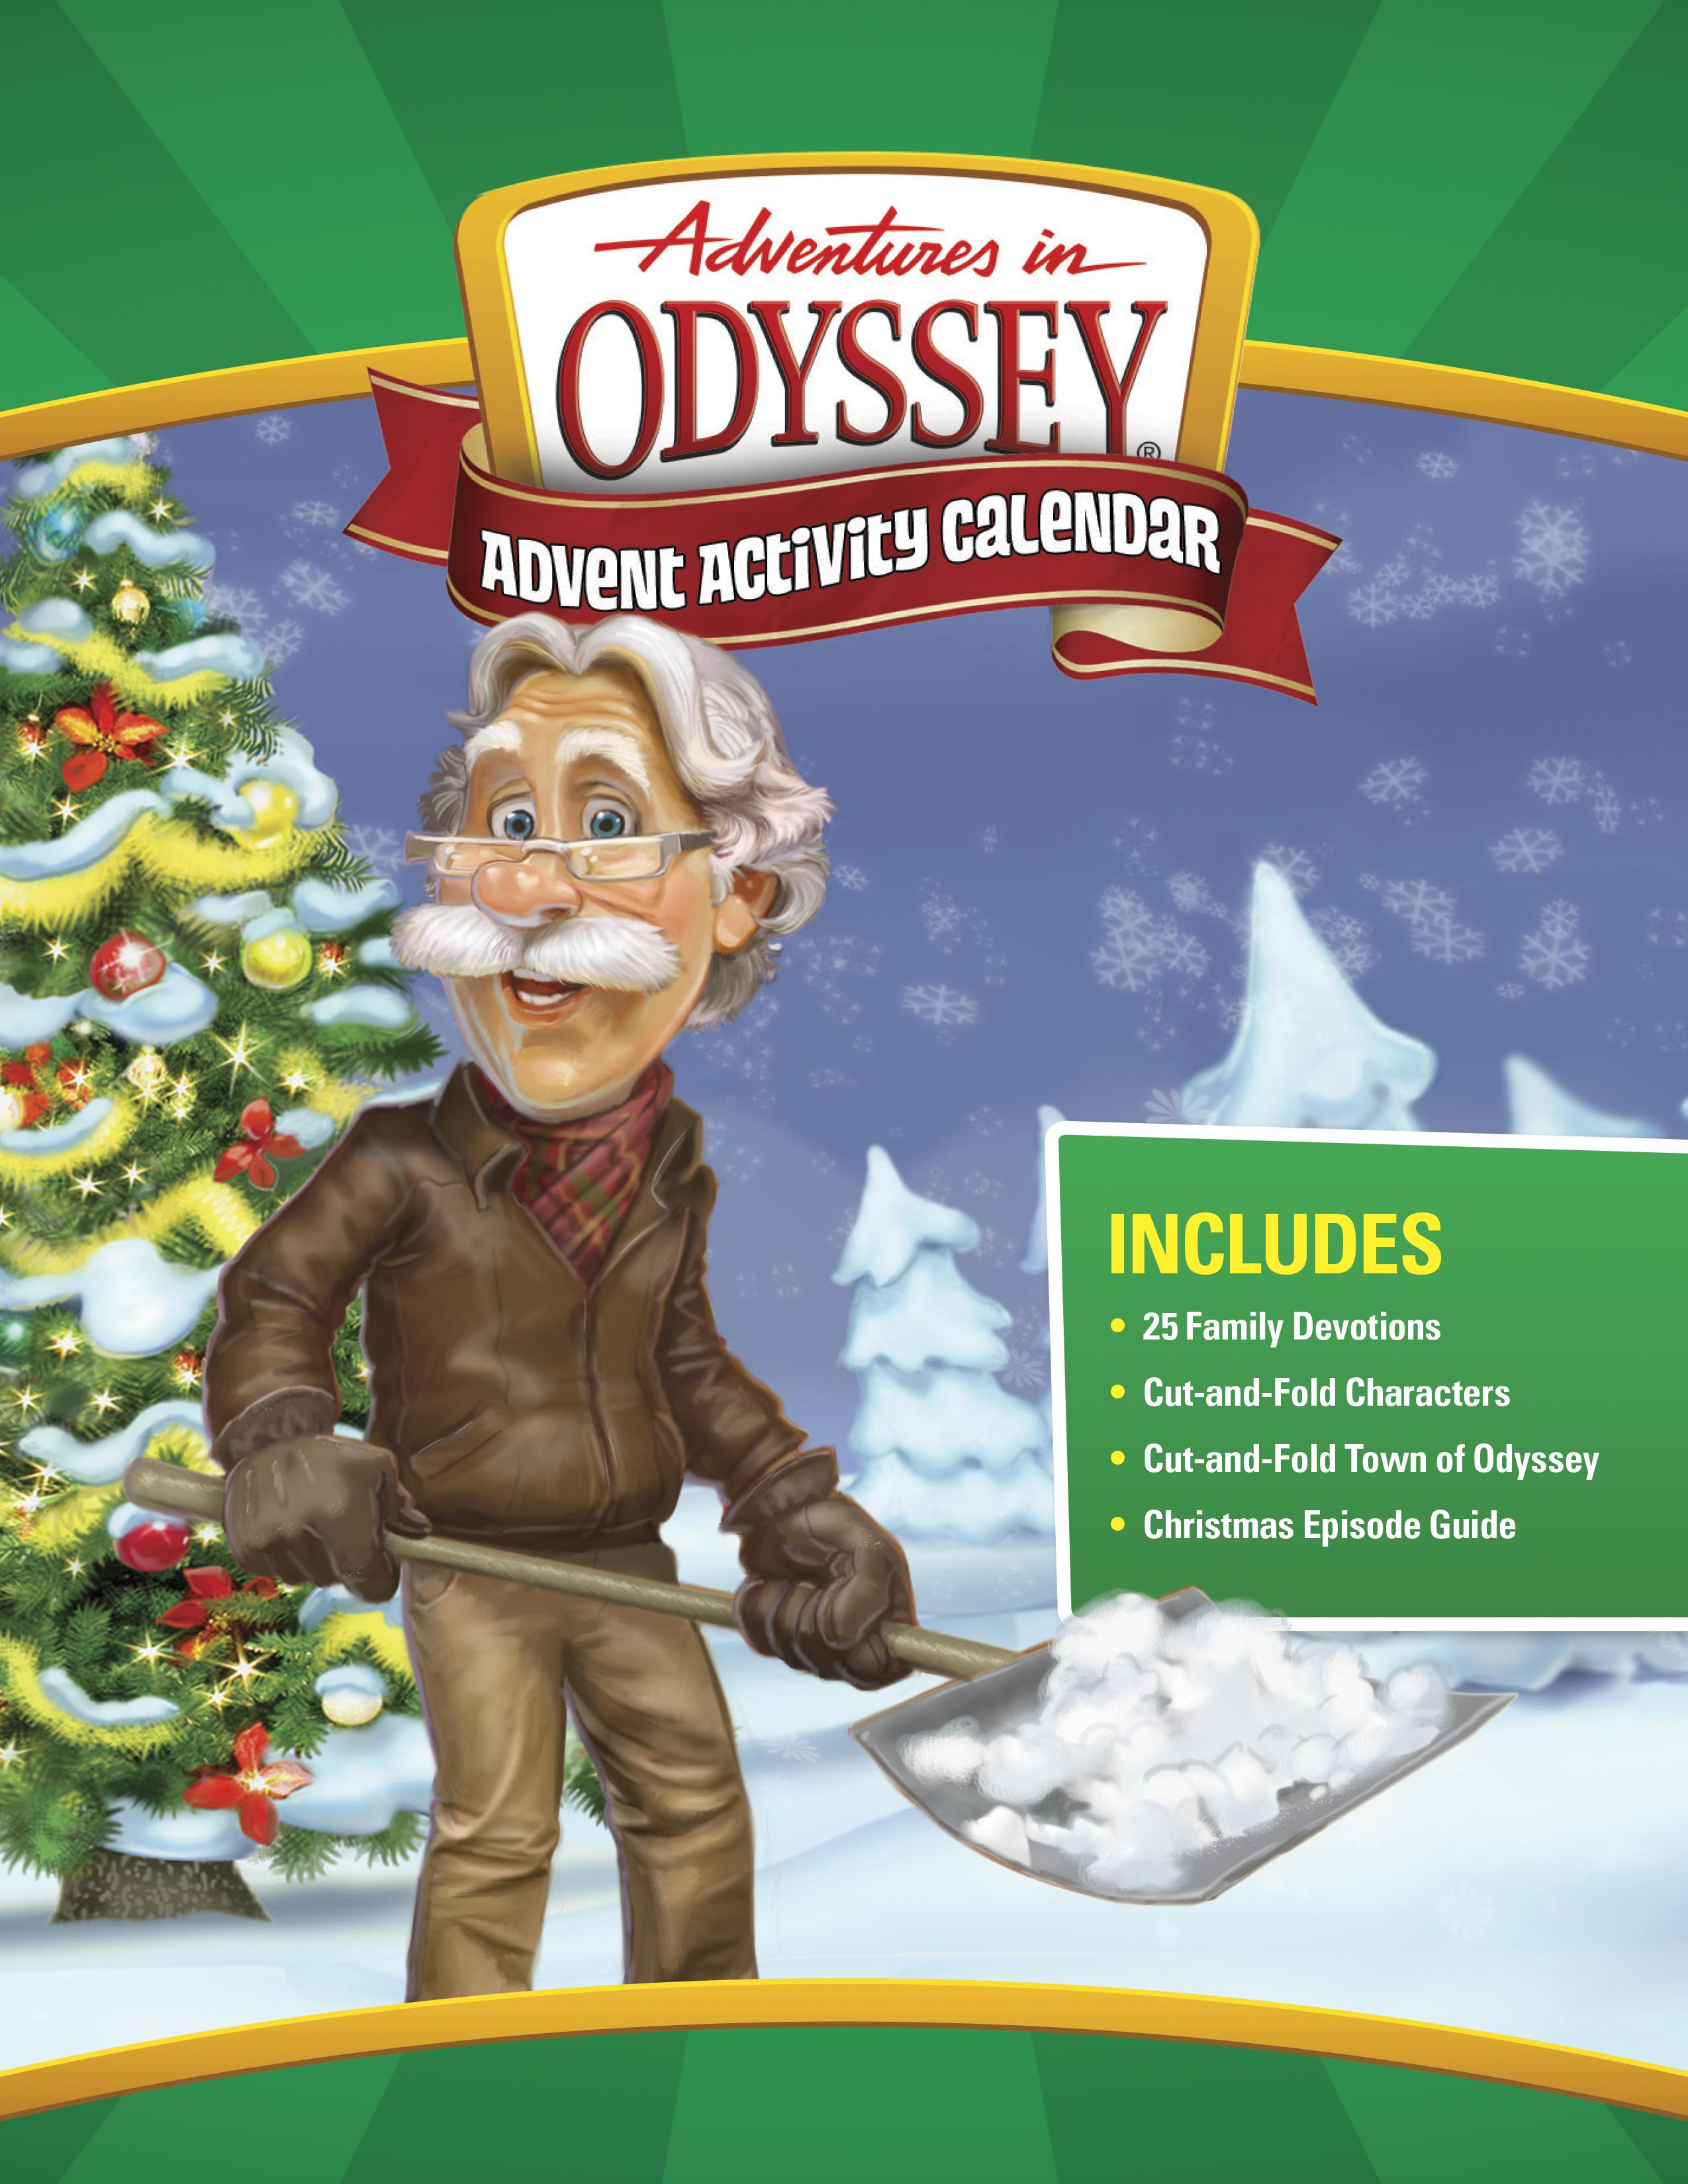 Adventures in Odyssey Advent Activity Calendar